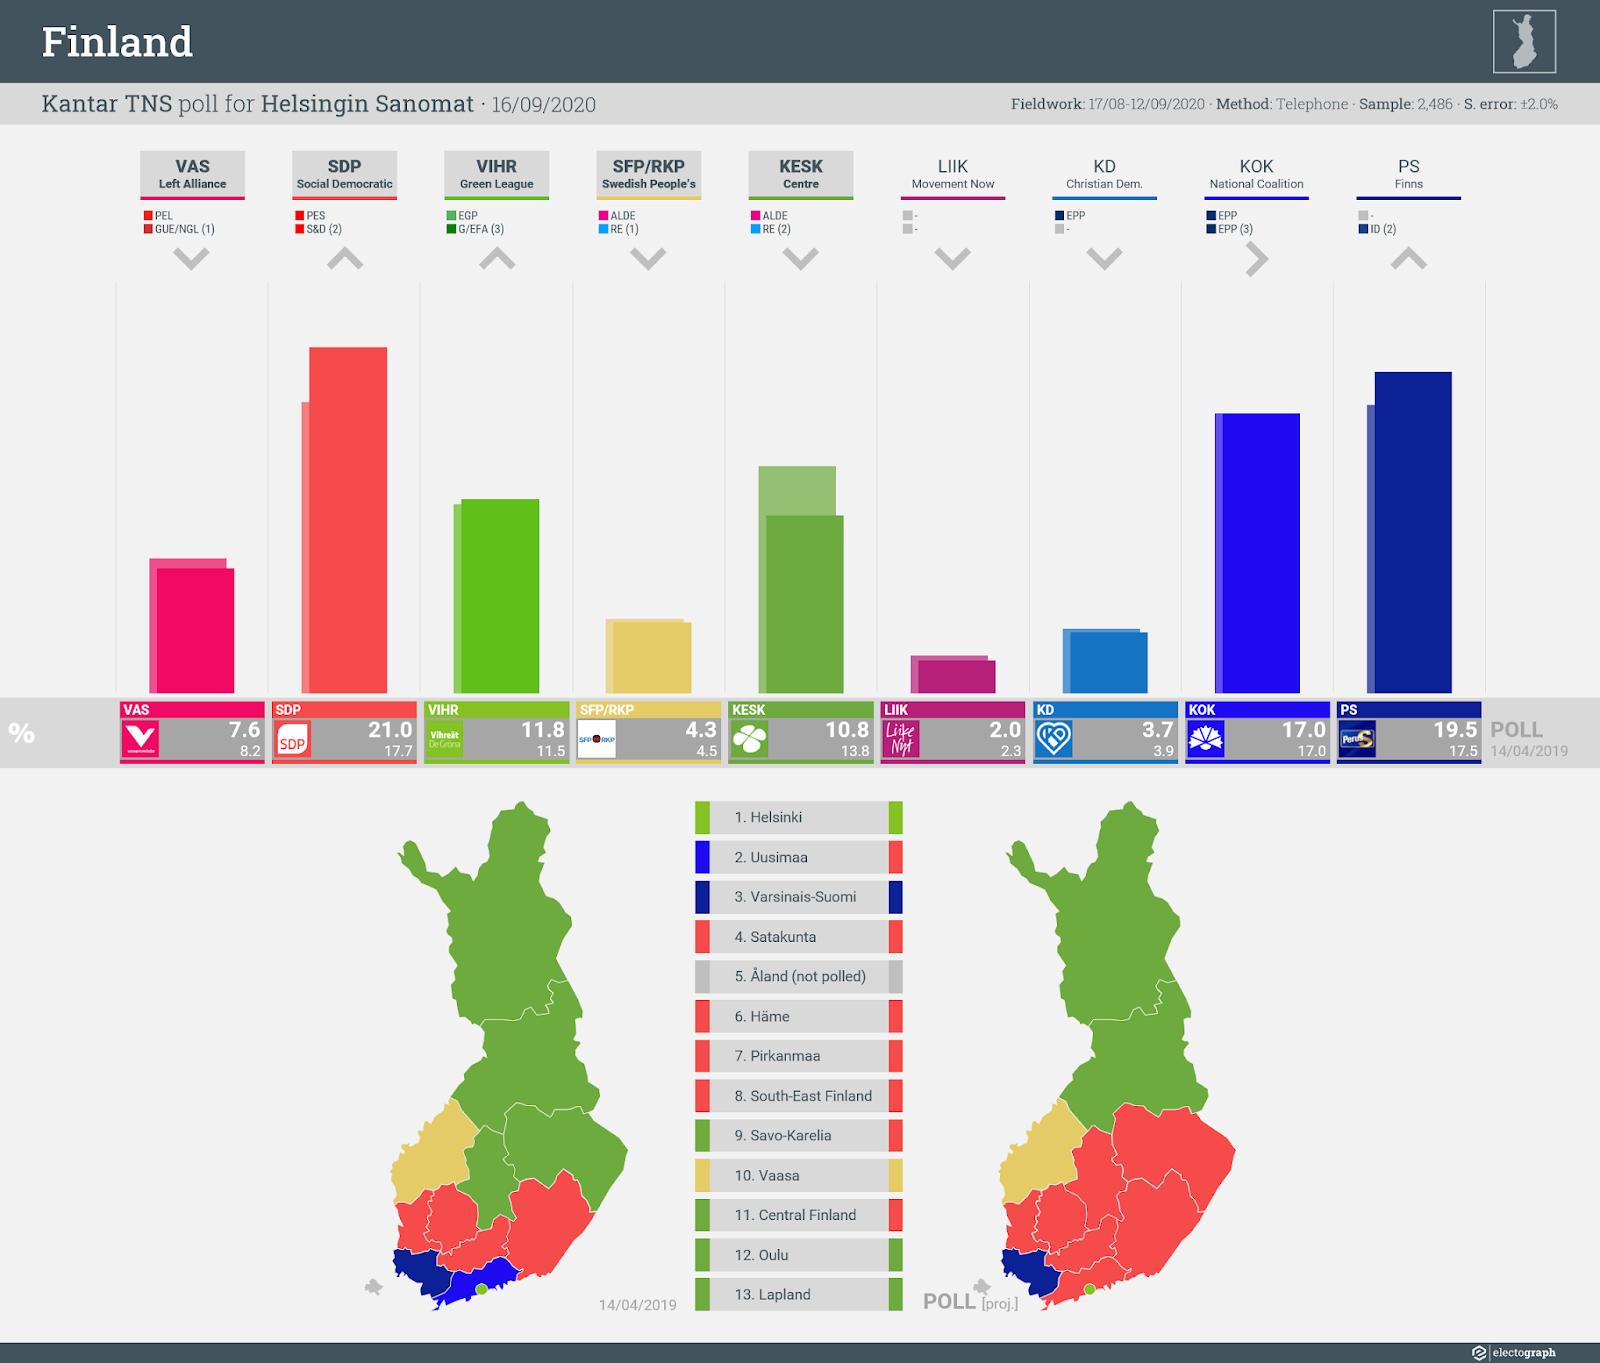 FINLAND: Kantar TNS poll chart for Helsingin Sanomat, 16 September 2020